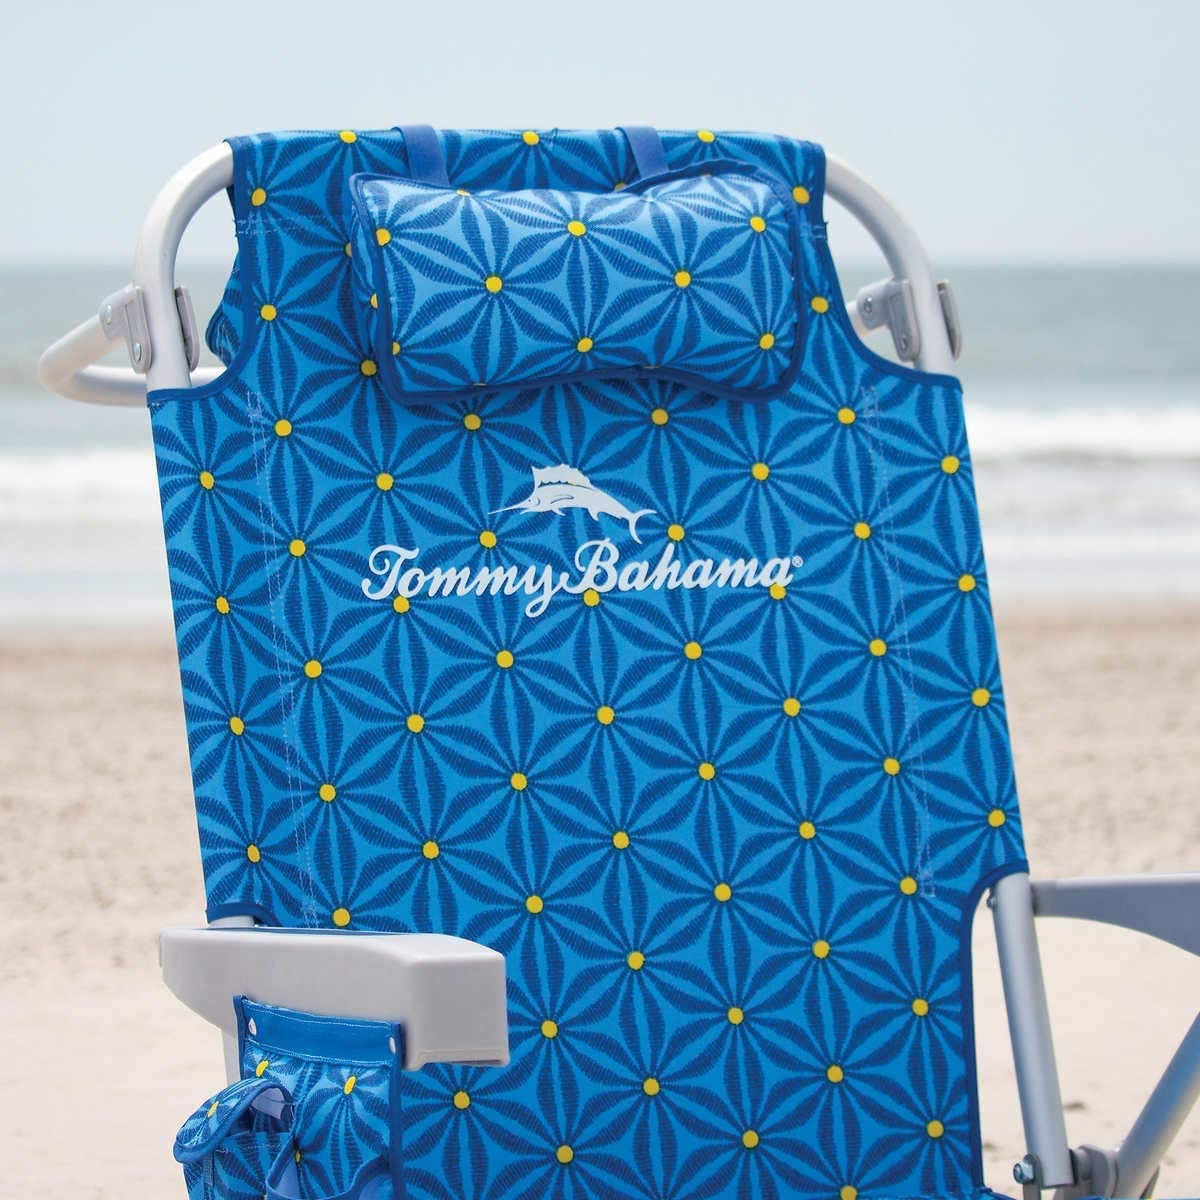 TECNOVOZ Pack 2 Sillas Port/átil Y 1 Sombrilla De Playa Tommy Bahama Azul